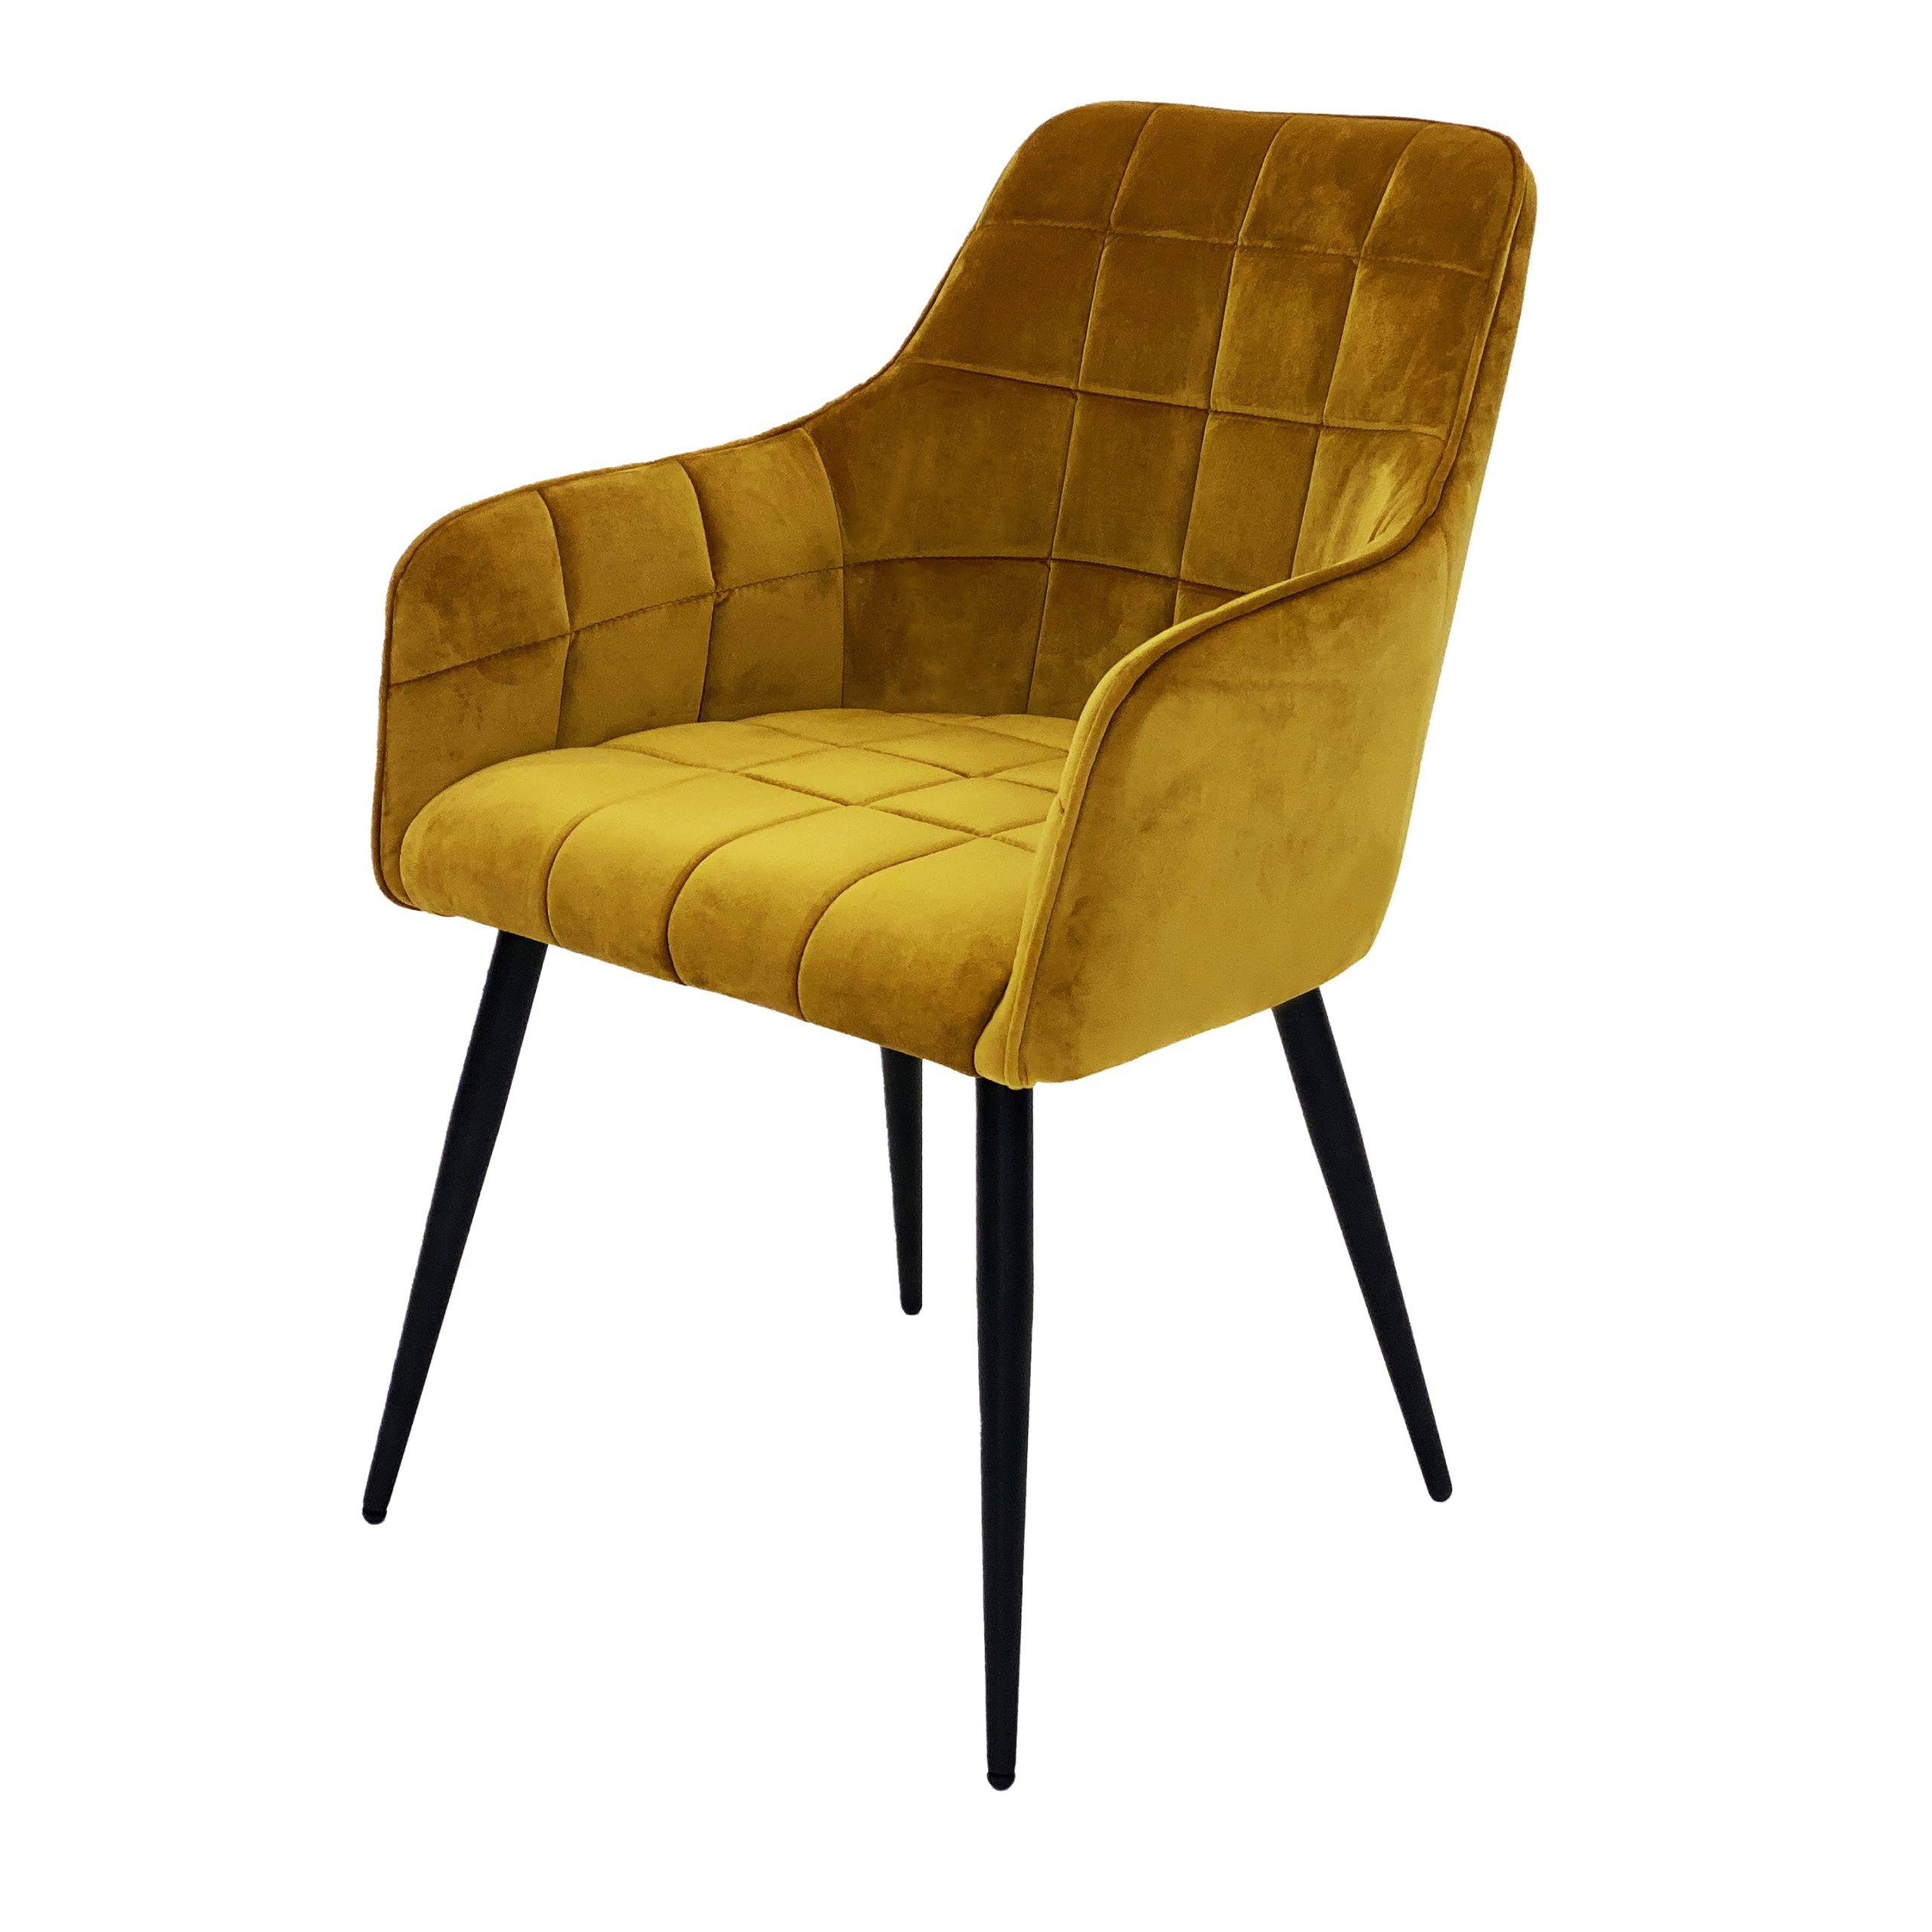 Evie mustard yellow velvet dining chair